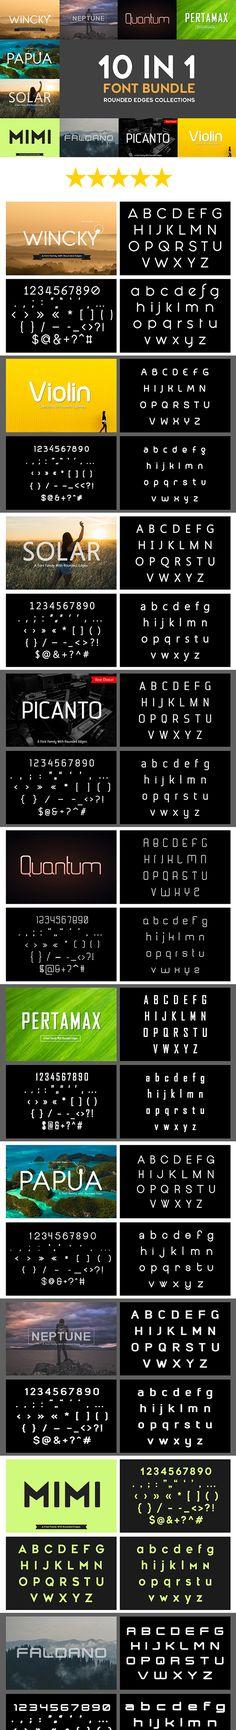 10 In 1 Font Bundle Download here: https://graphicriver.net/item/10-in-1-font-bundle/19444126?ref=KlitVogli